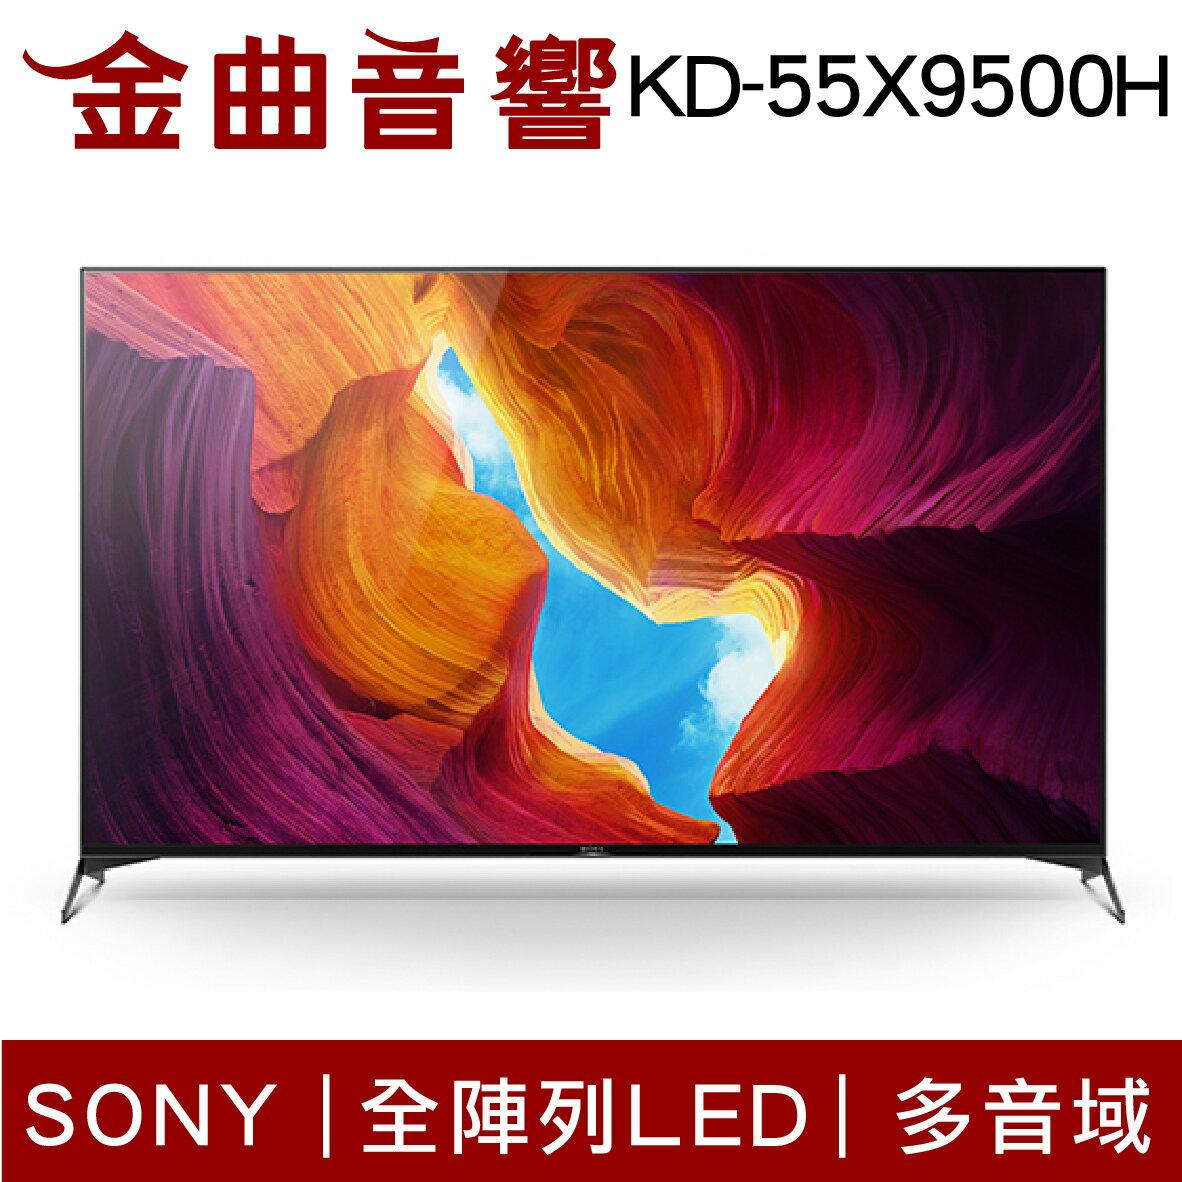 SONY 索尼 KD-55X9500H 4K LED 55吋 液晶 電視 2020   金曲音響